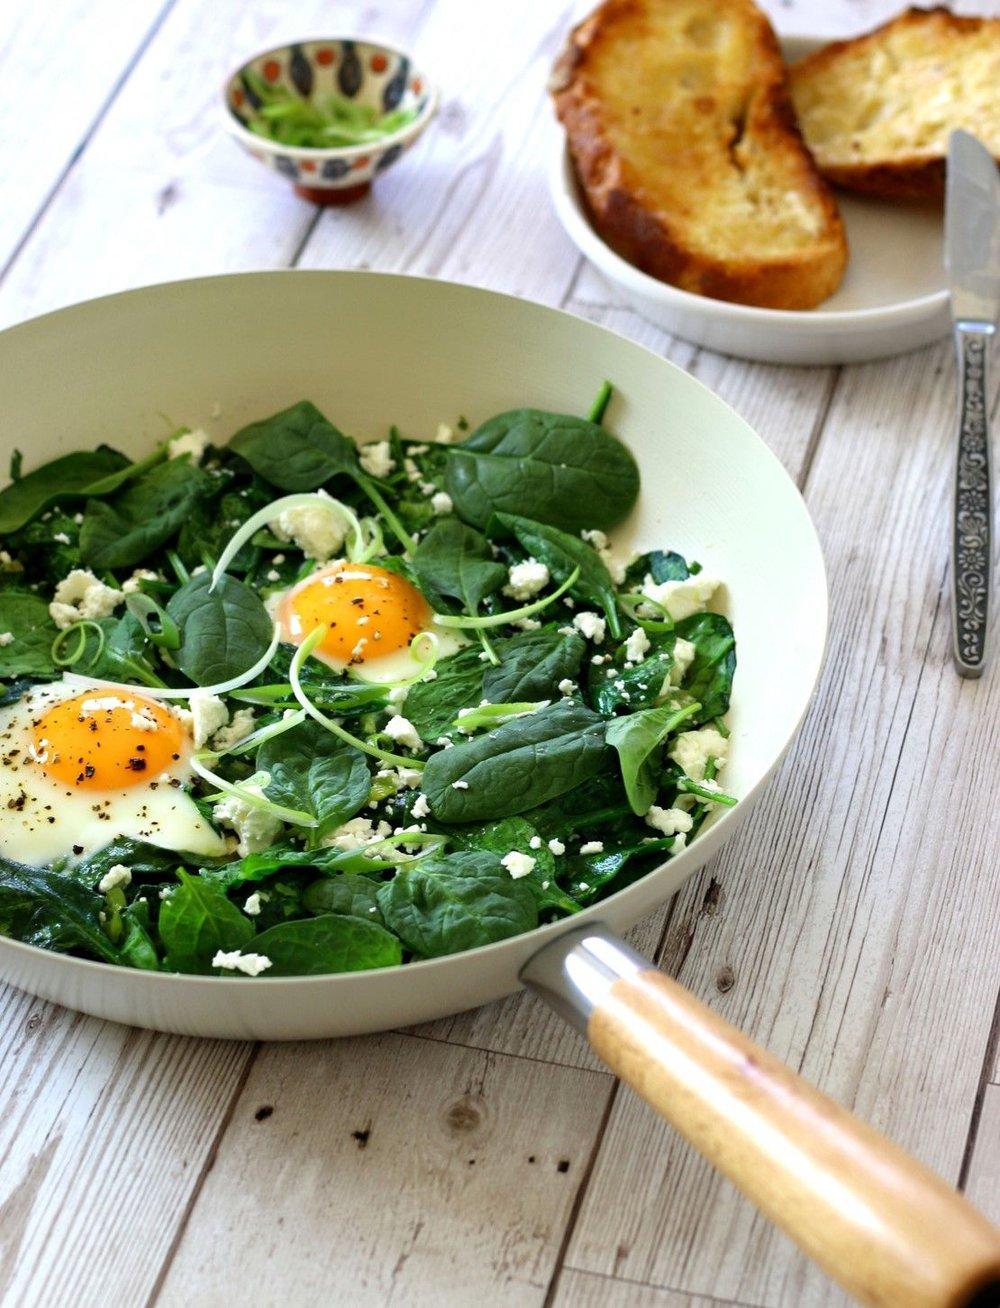 green-shakshuka-eggs-breakfast-recipe-tiny-budget-cooking.jpg